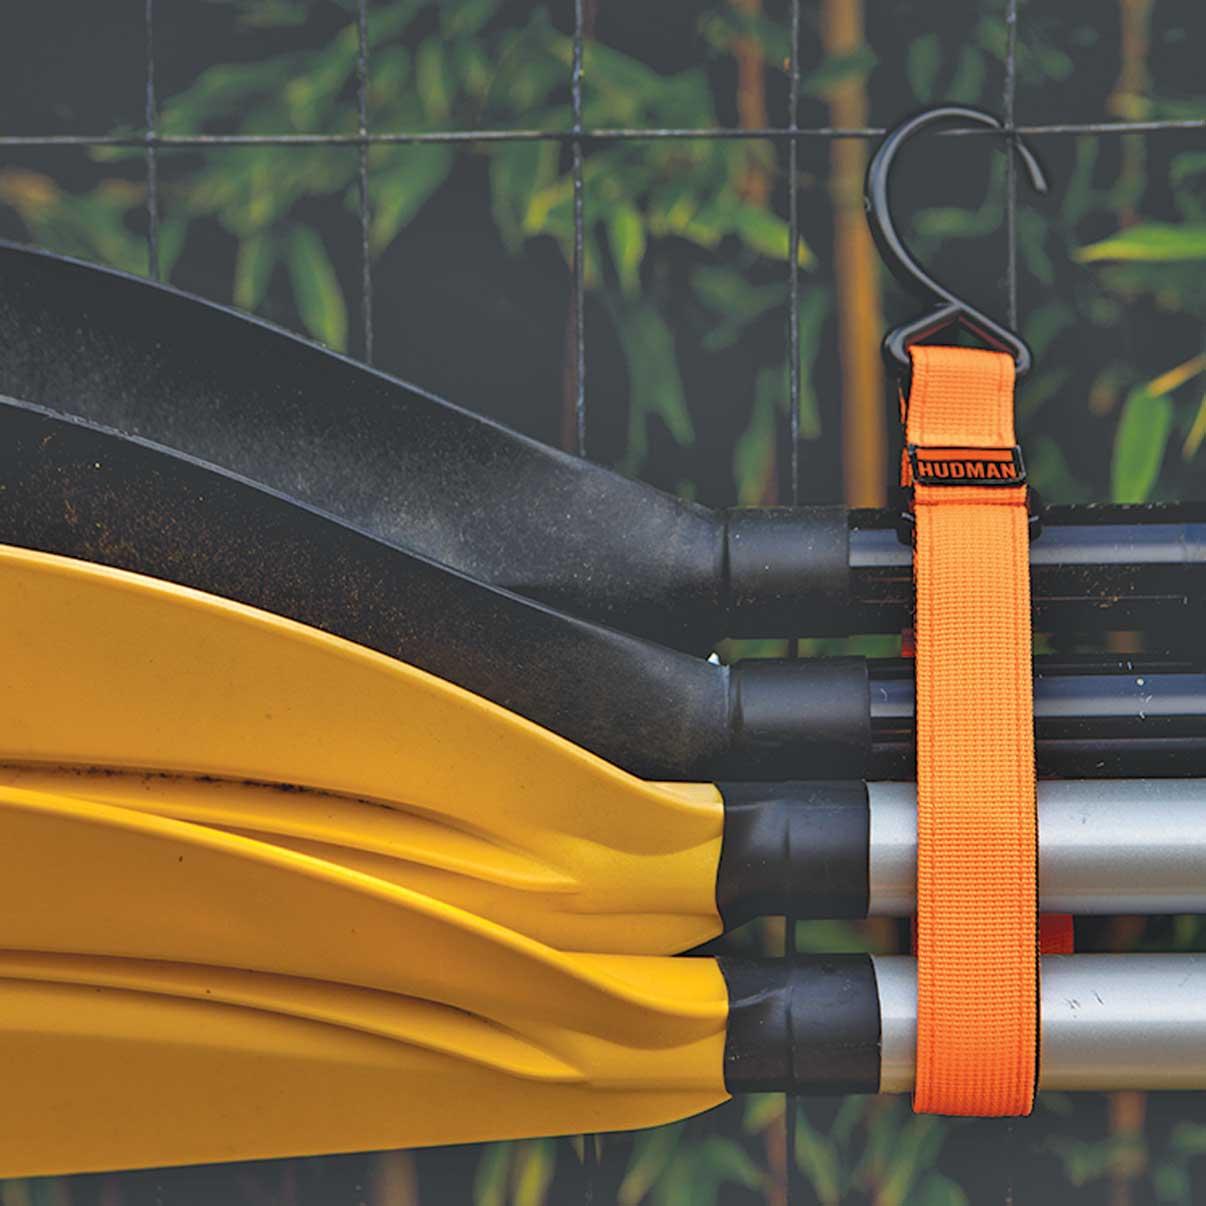 Use the Hudman Strap & Hook to hang oars & paddles